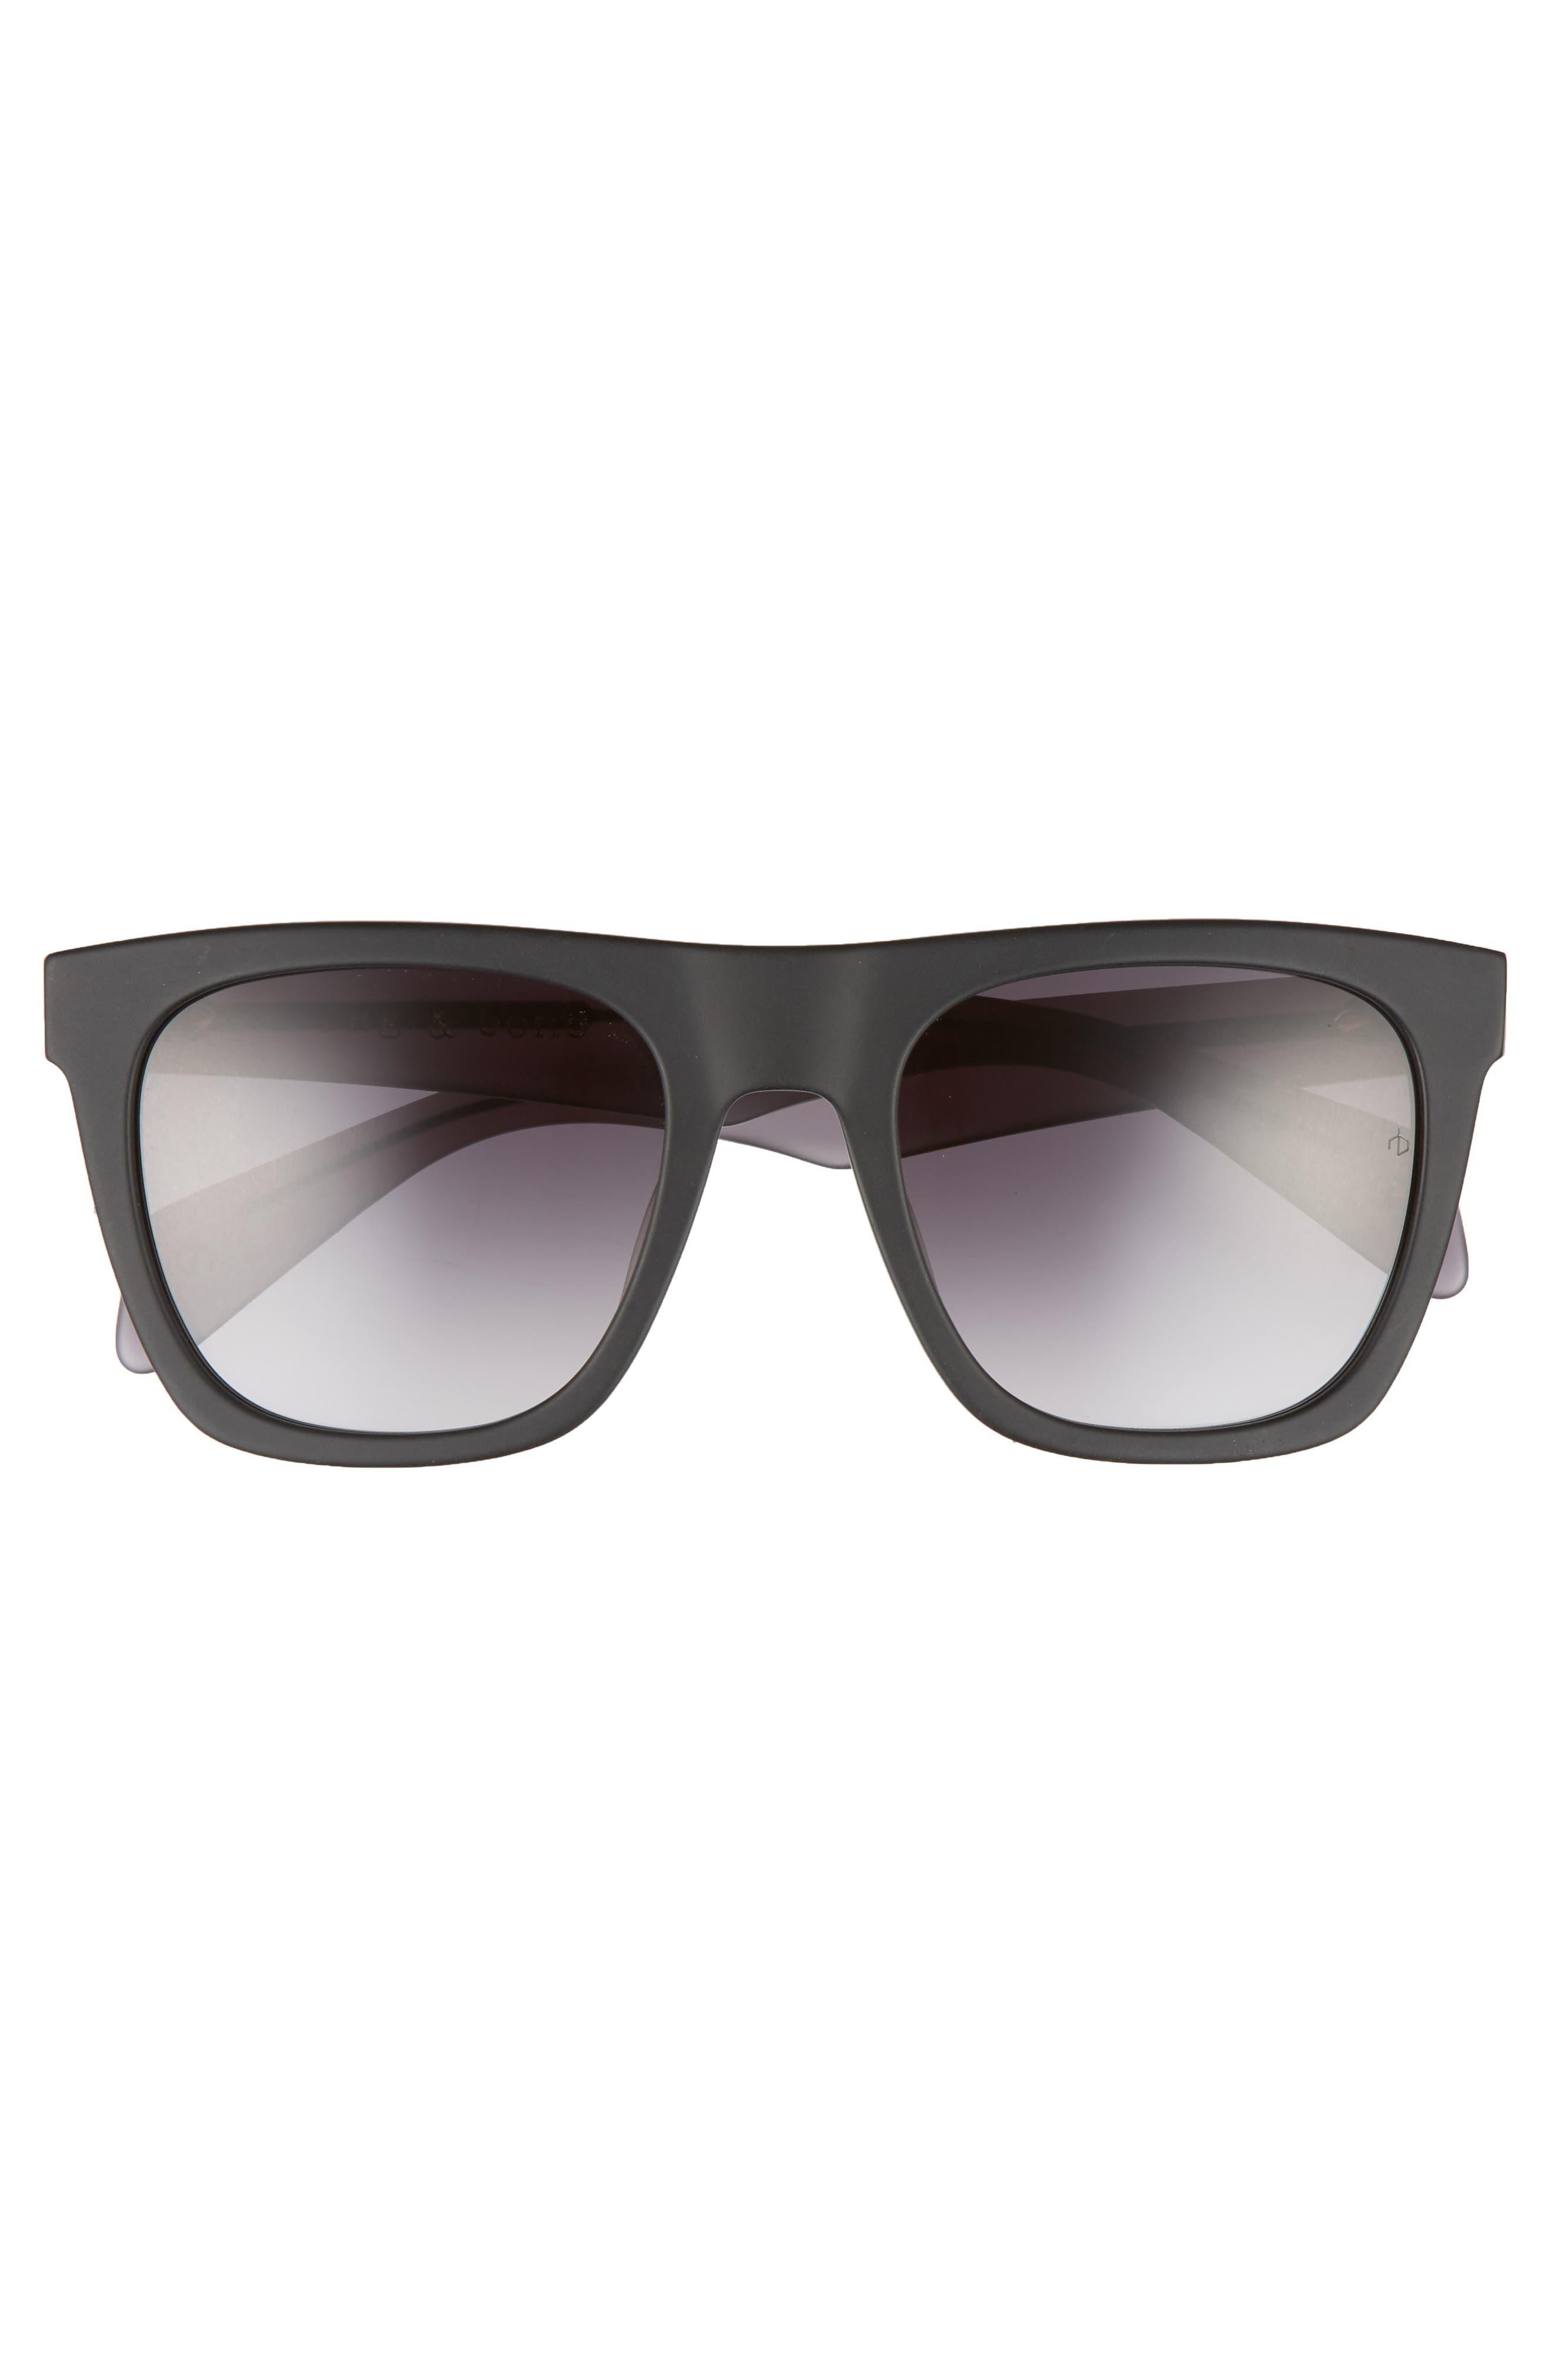 54mm Gradient Sunglasses,                             Alternate thumbnail 2, color,                             BLUE/ DARK GREY